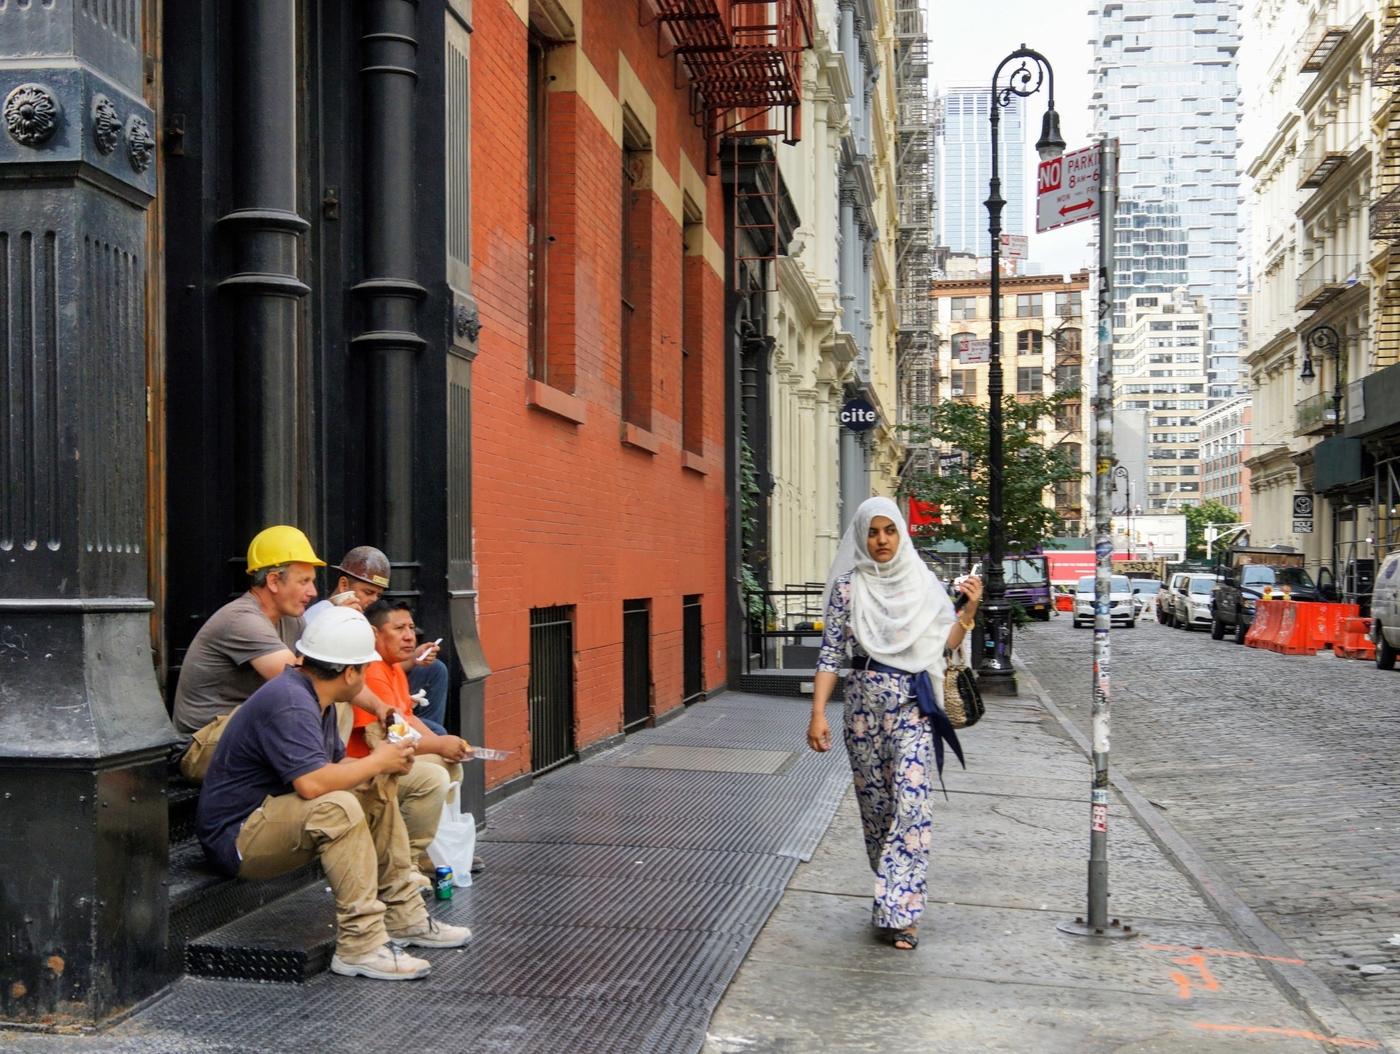 michael-rabin-street-photography-09.jpg